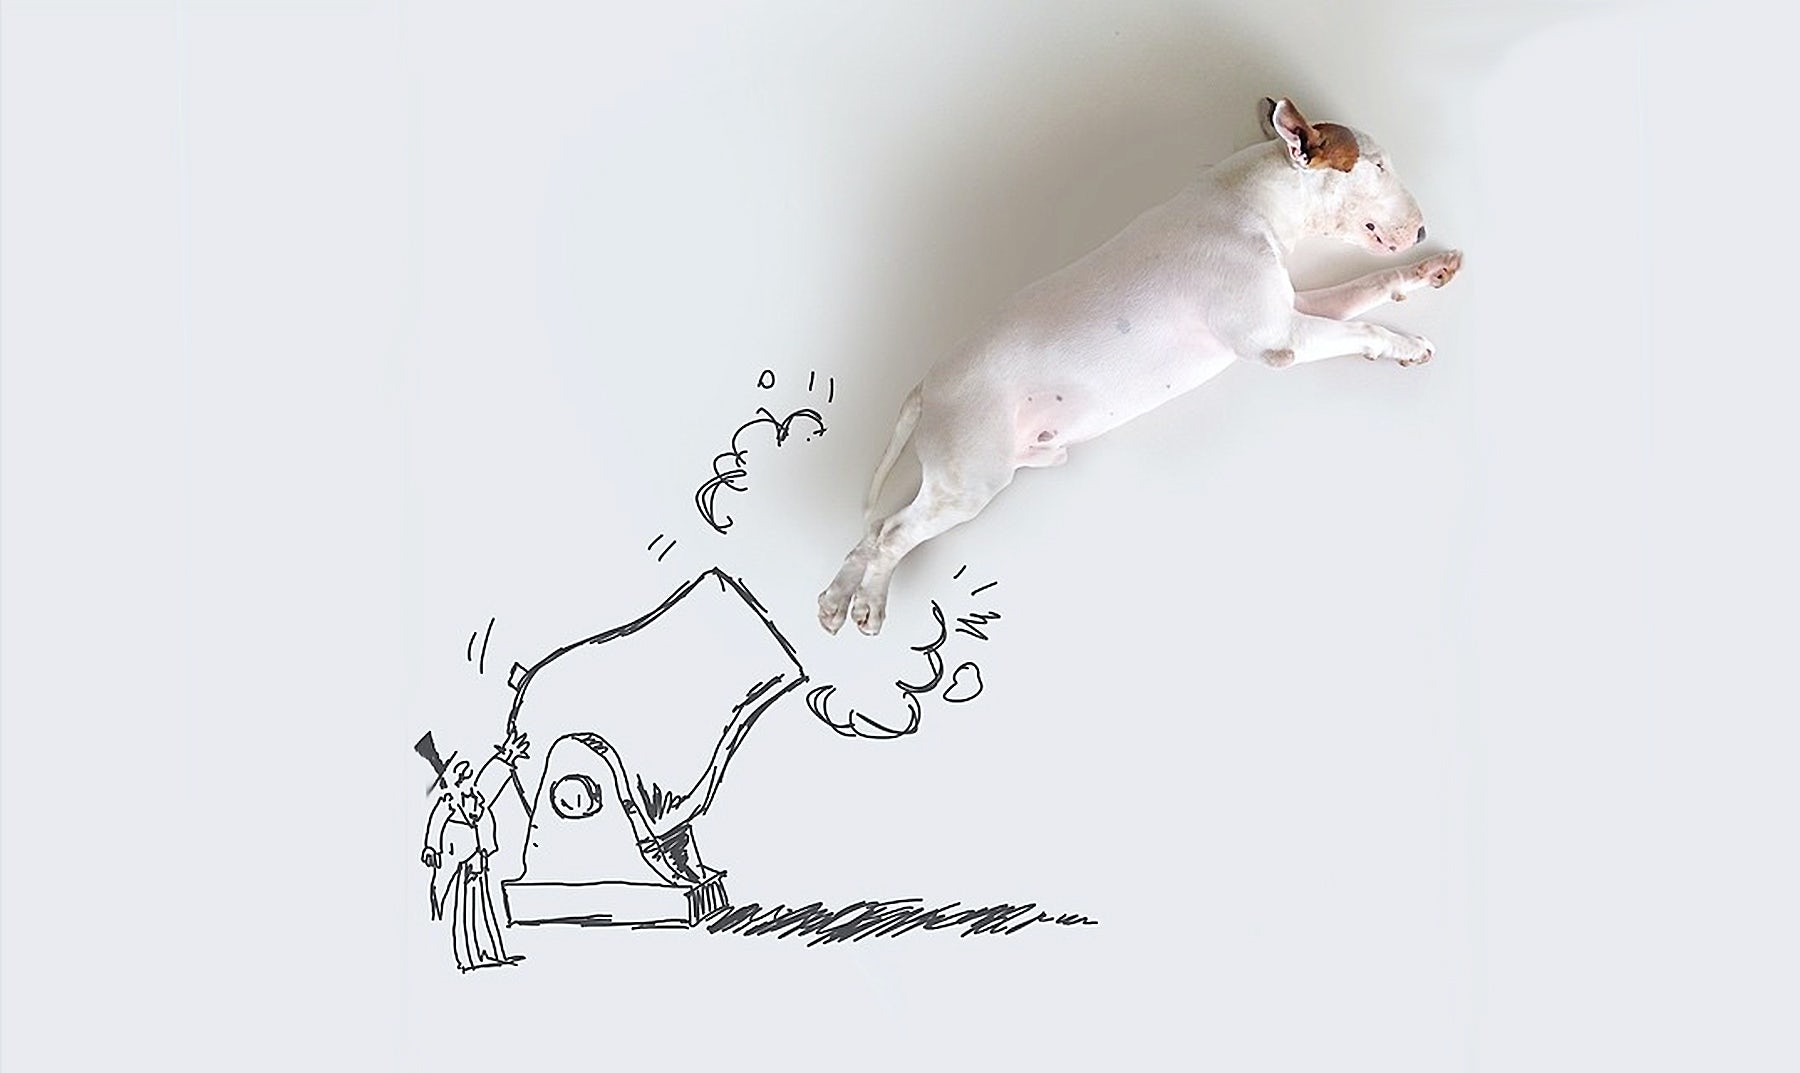 Rafael Mantesso illustration of Jimmy Choo the dog | Source: Rafael Mantesso